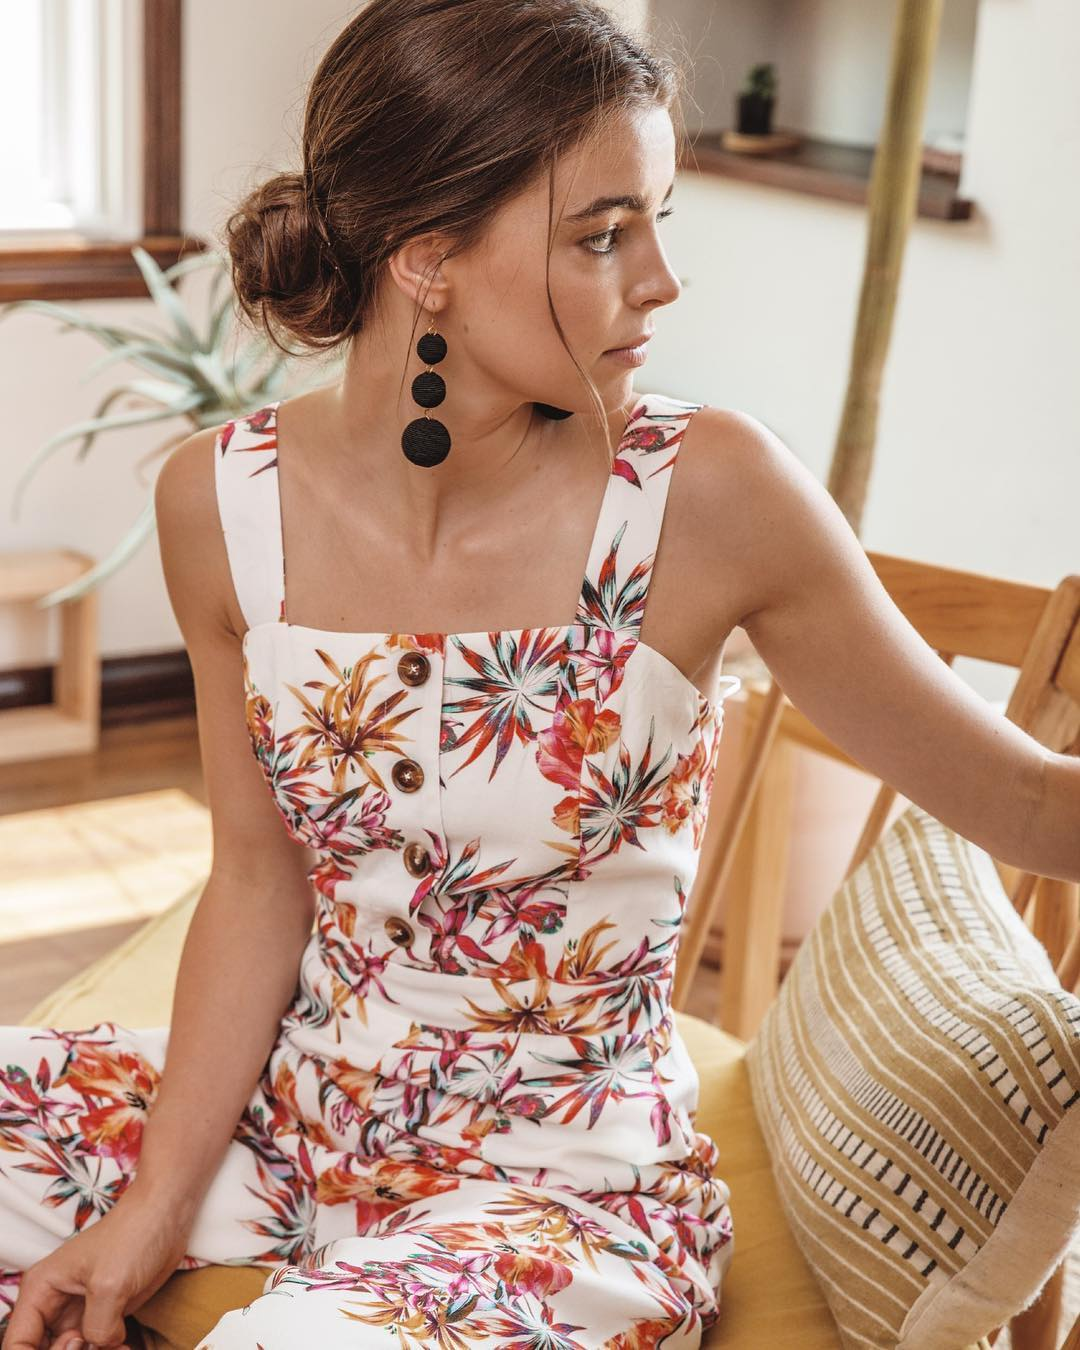 adelyn rae Eloise adelyn-rae-eloise-woven-printed-culottes